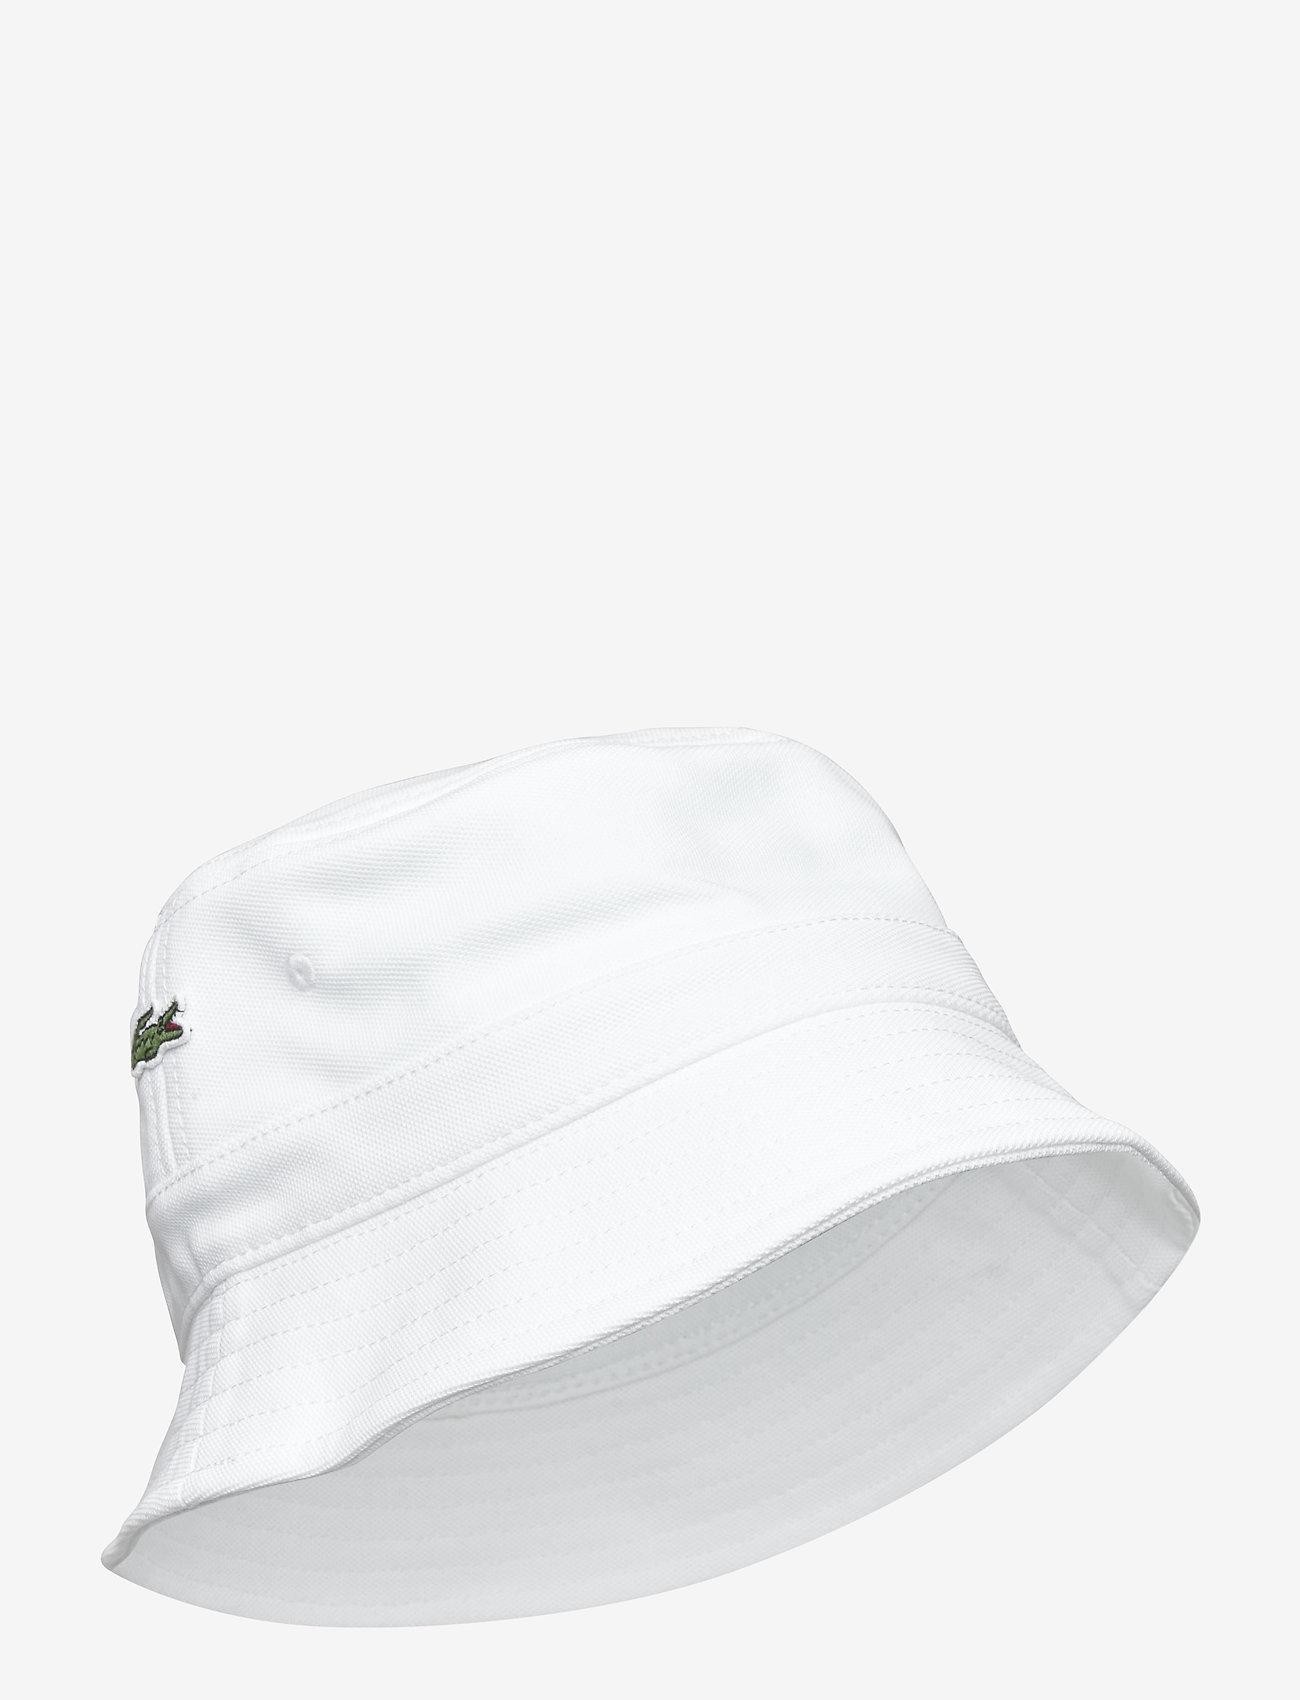 Lacoste - Cap - bucket hats - white - 0